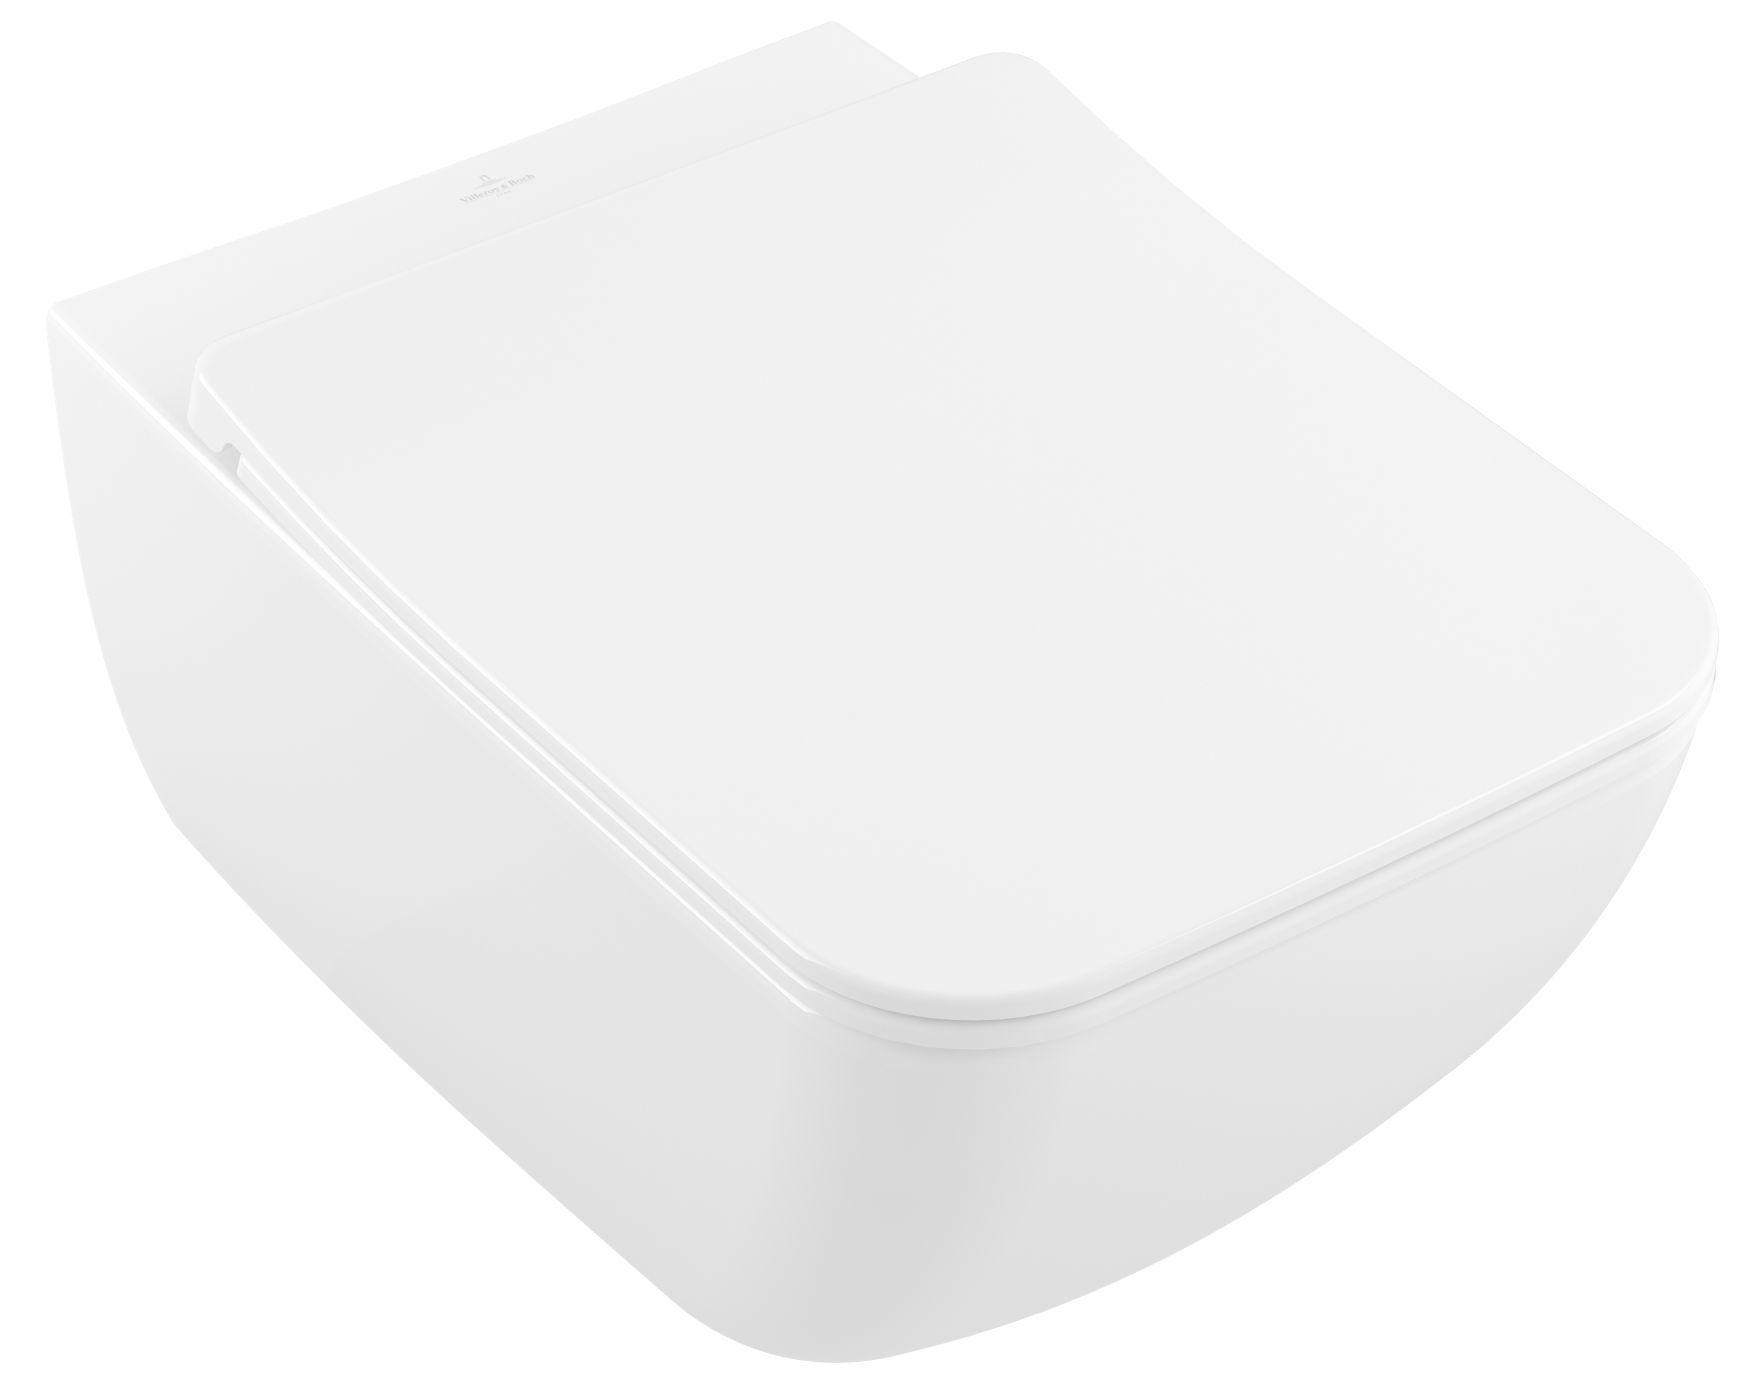 Villeroy & Boch Venticello Wand-Tiefspül-WC Combi-Pack DirectFlush L:56 B:37,5cm weiß mit CeramicPlus 4611RLR1